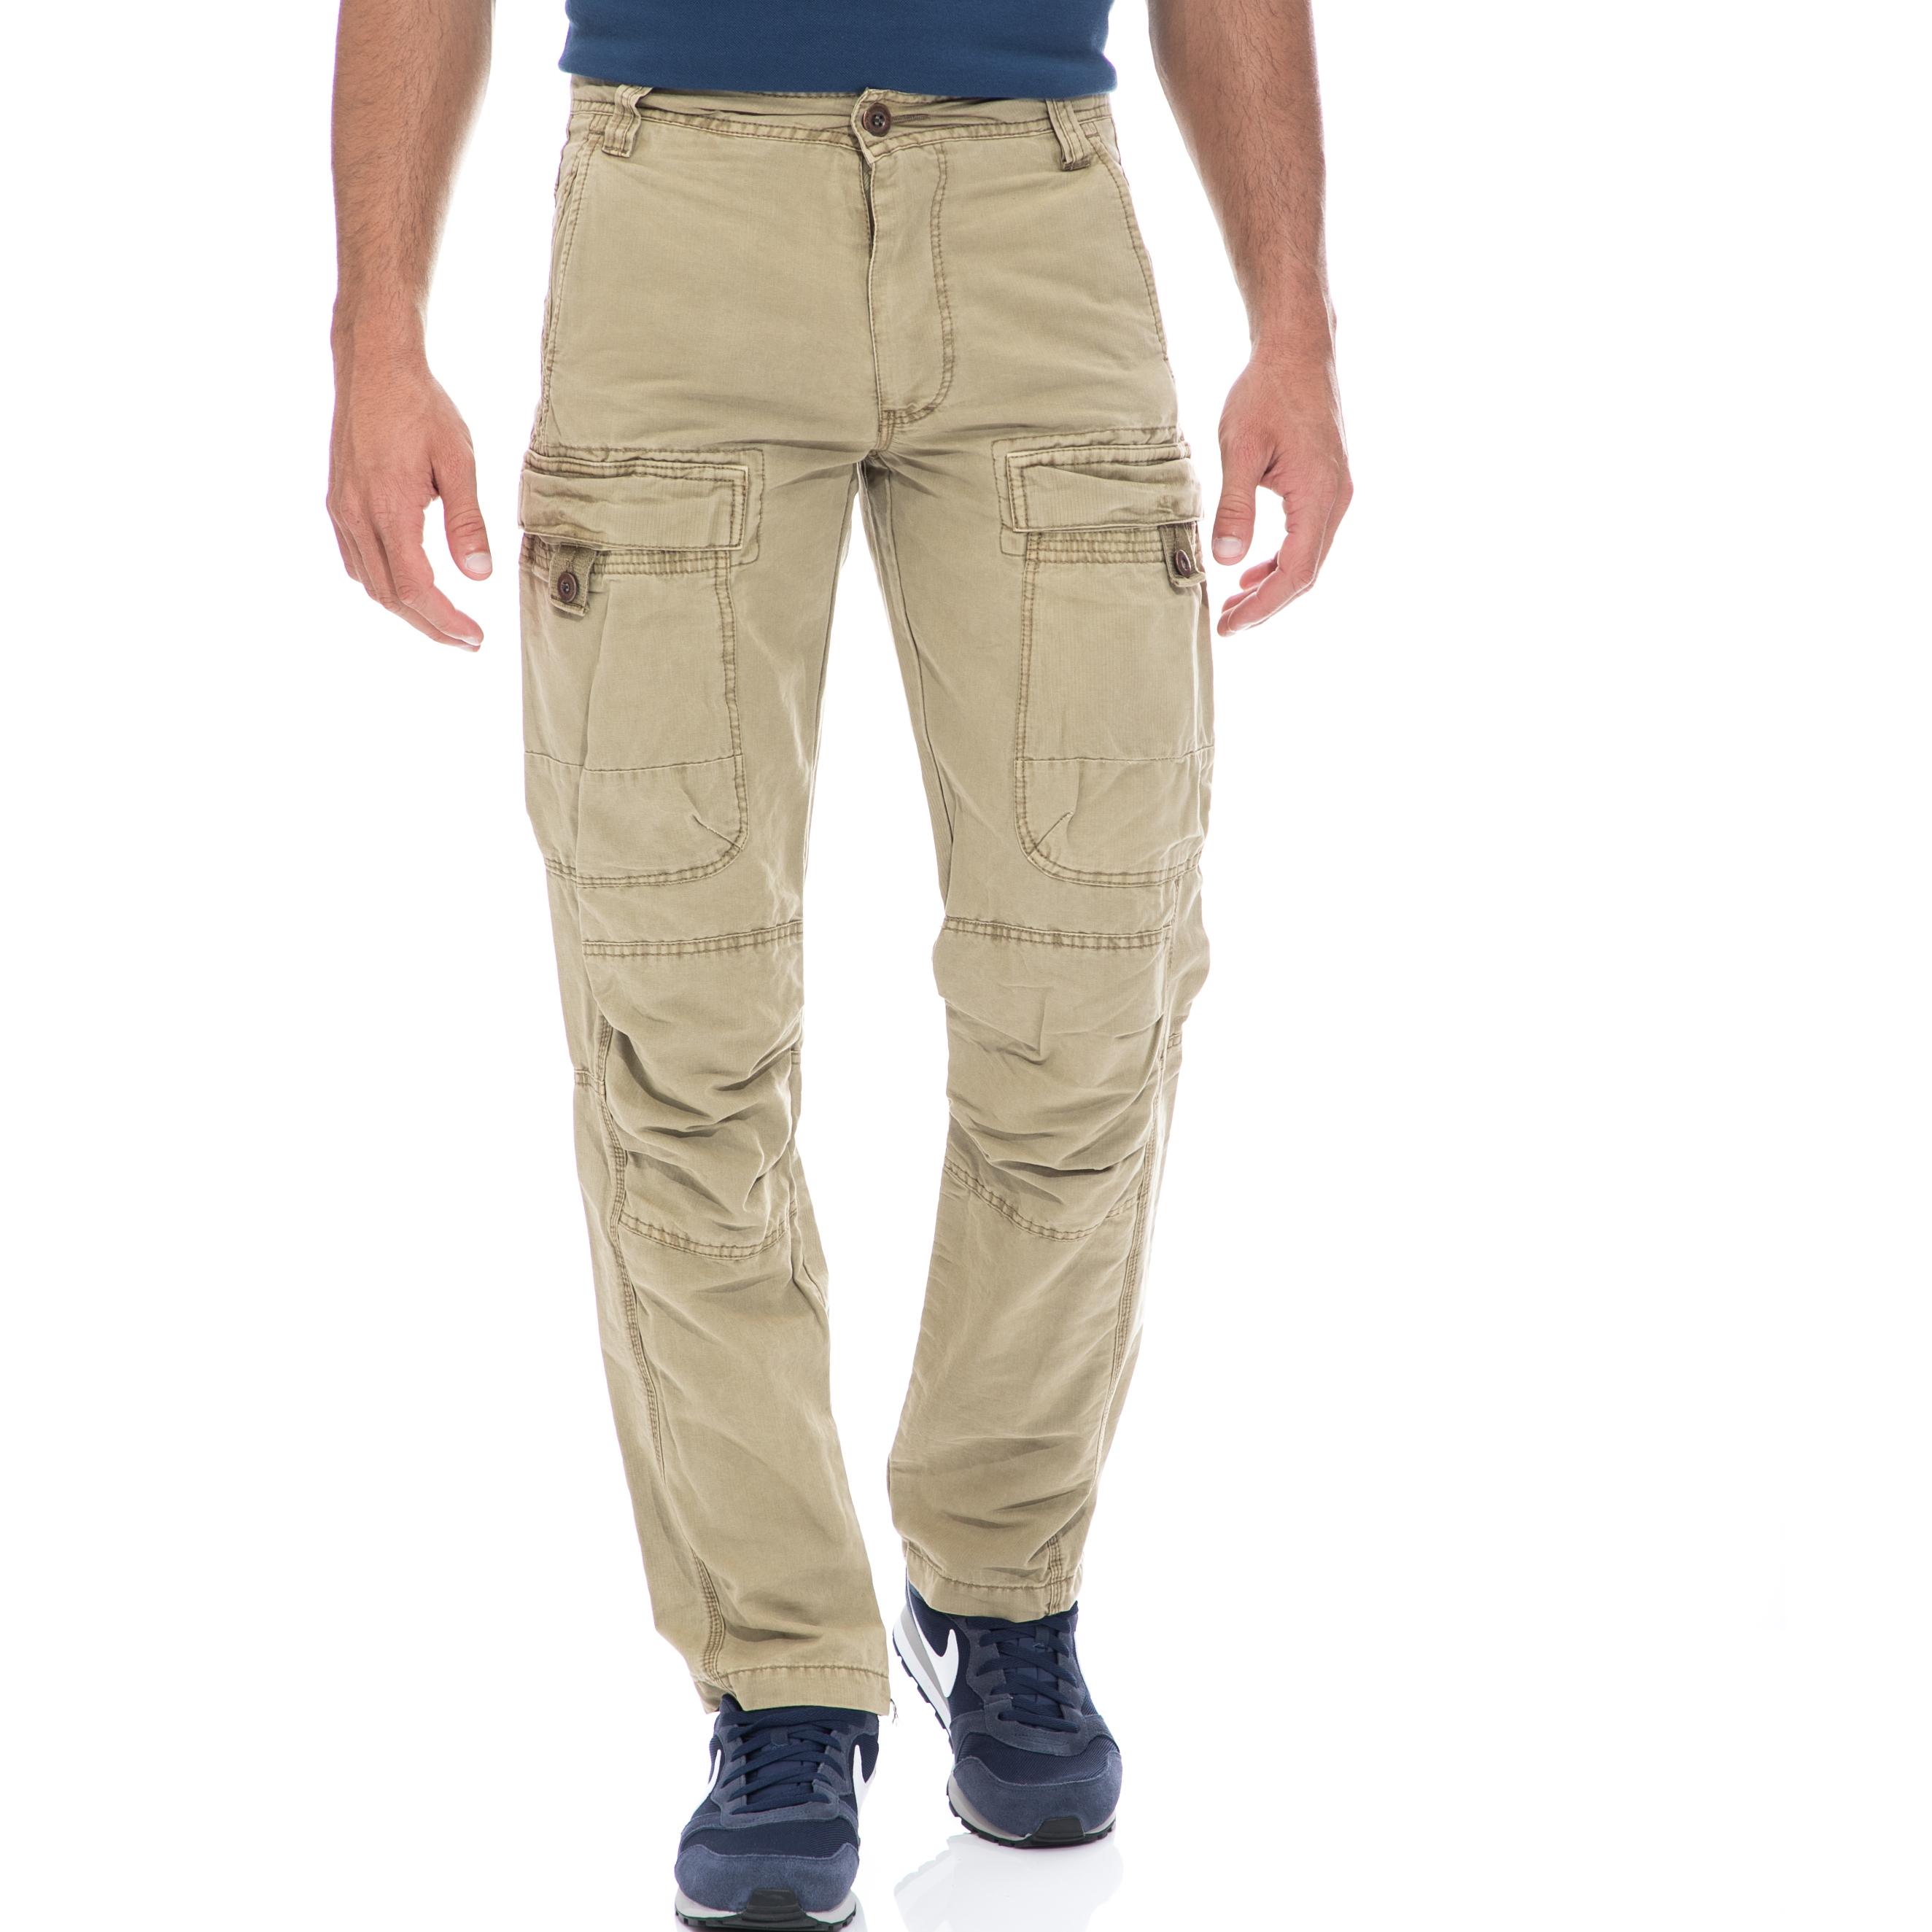 BATTERY – Ανδρικό παντελόνι Battery μπεζ